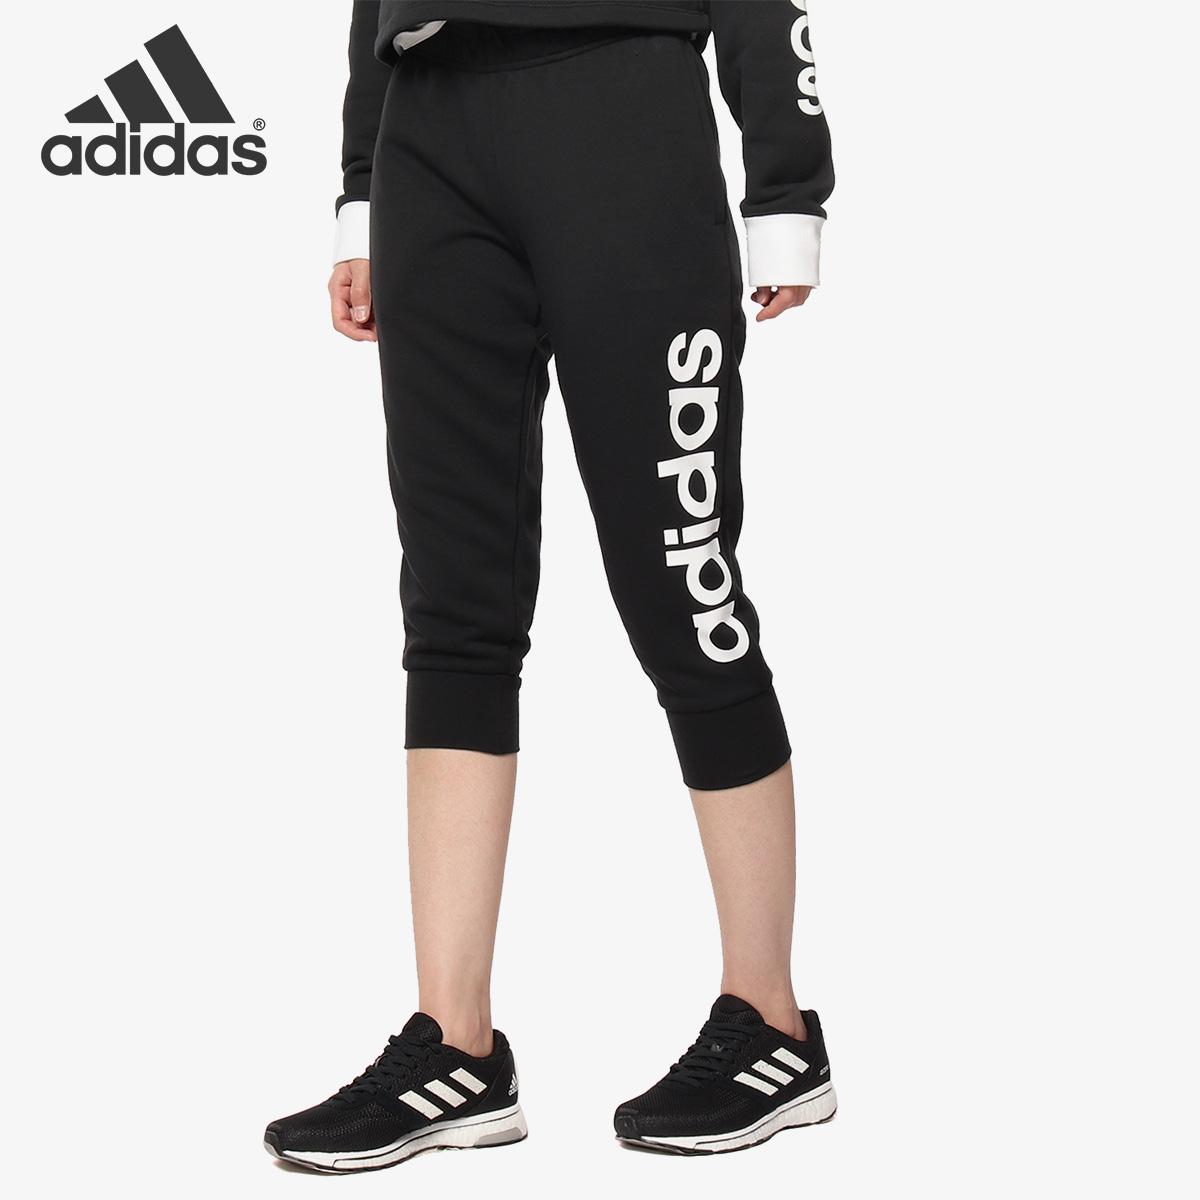 Adidas/阿迪達斯正品 ESS LIN 3/4 PT 女子休閑運動七分褲S97150